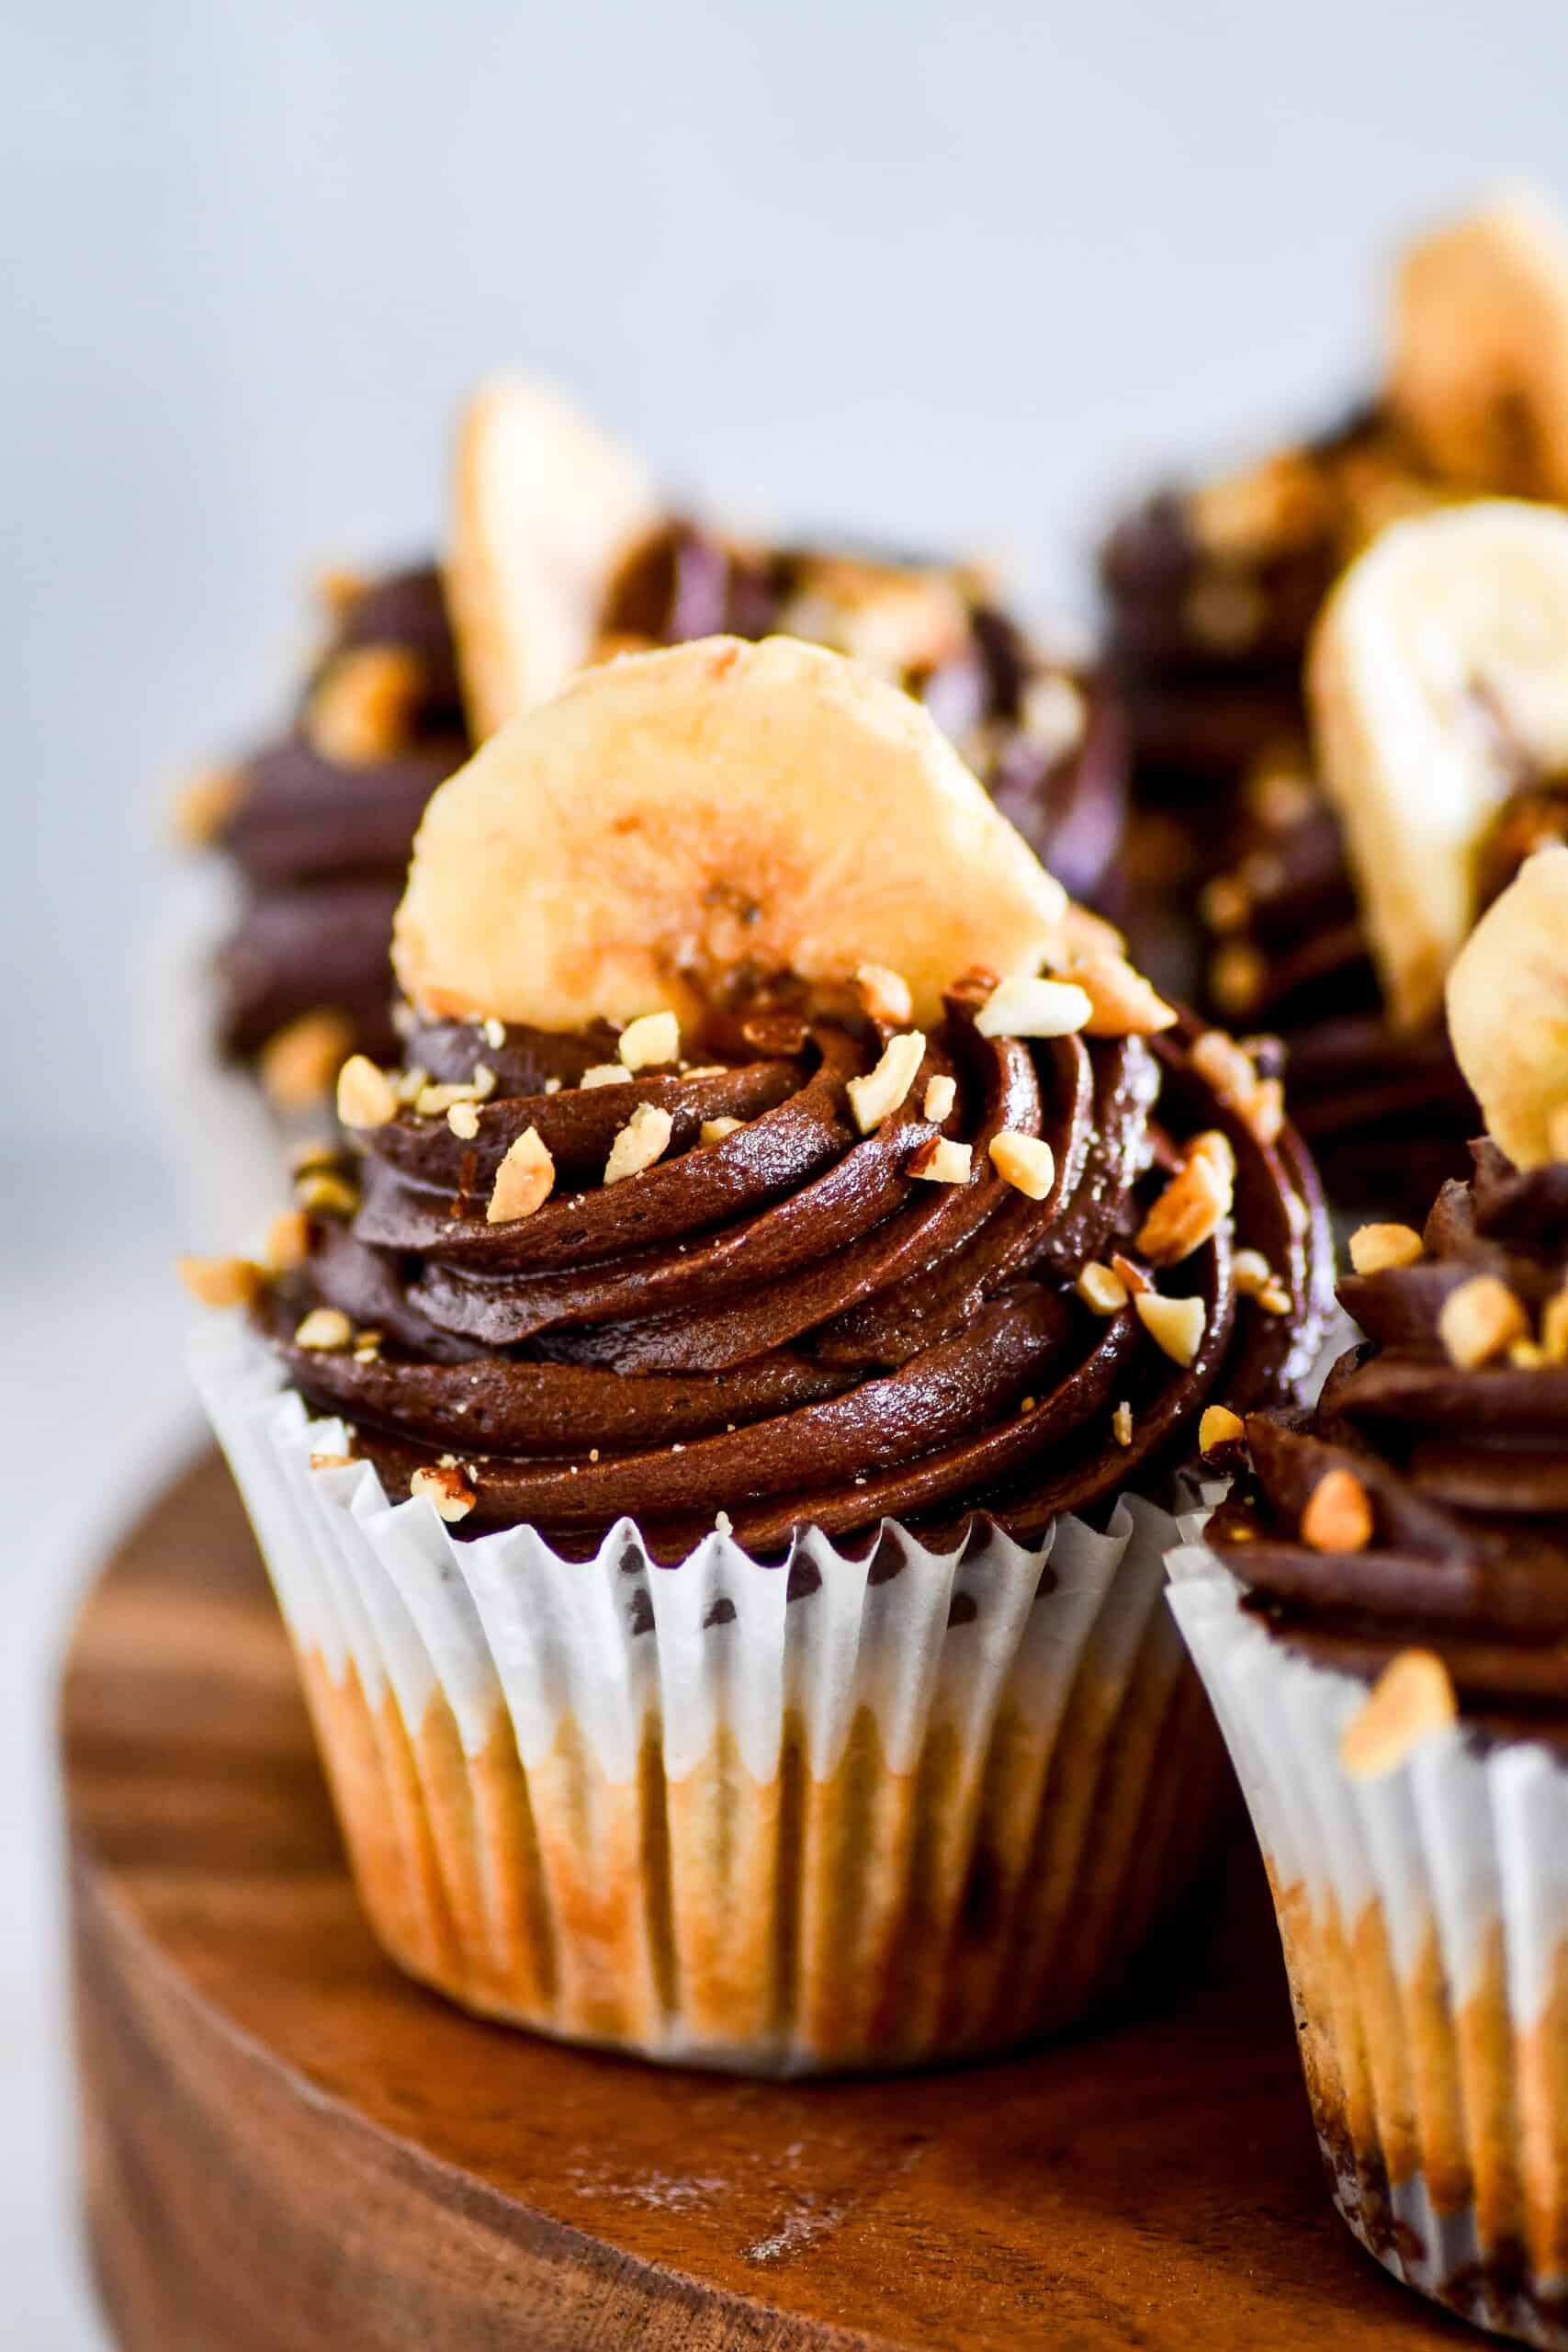 Peanut Butter Cup Banana Cupcakes Recipe